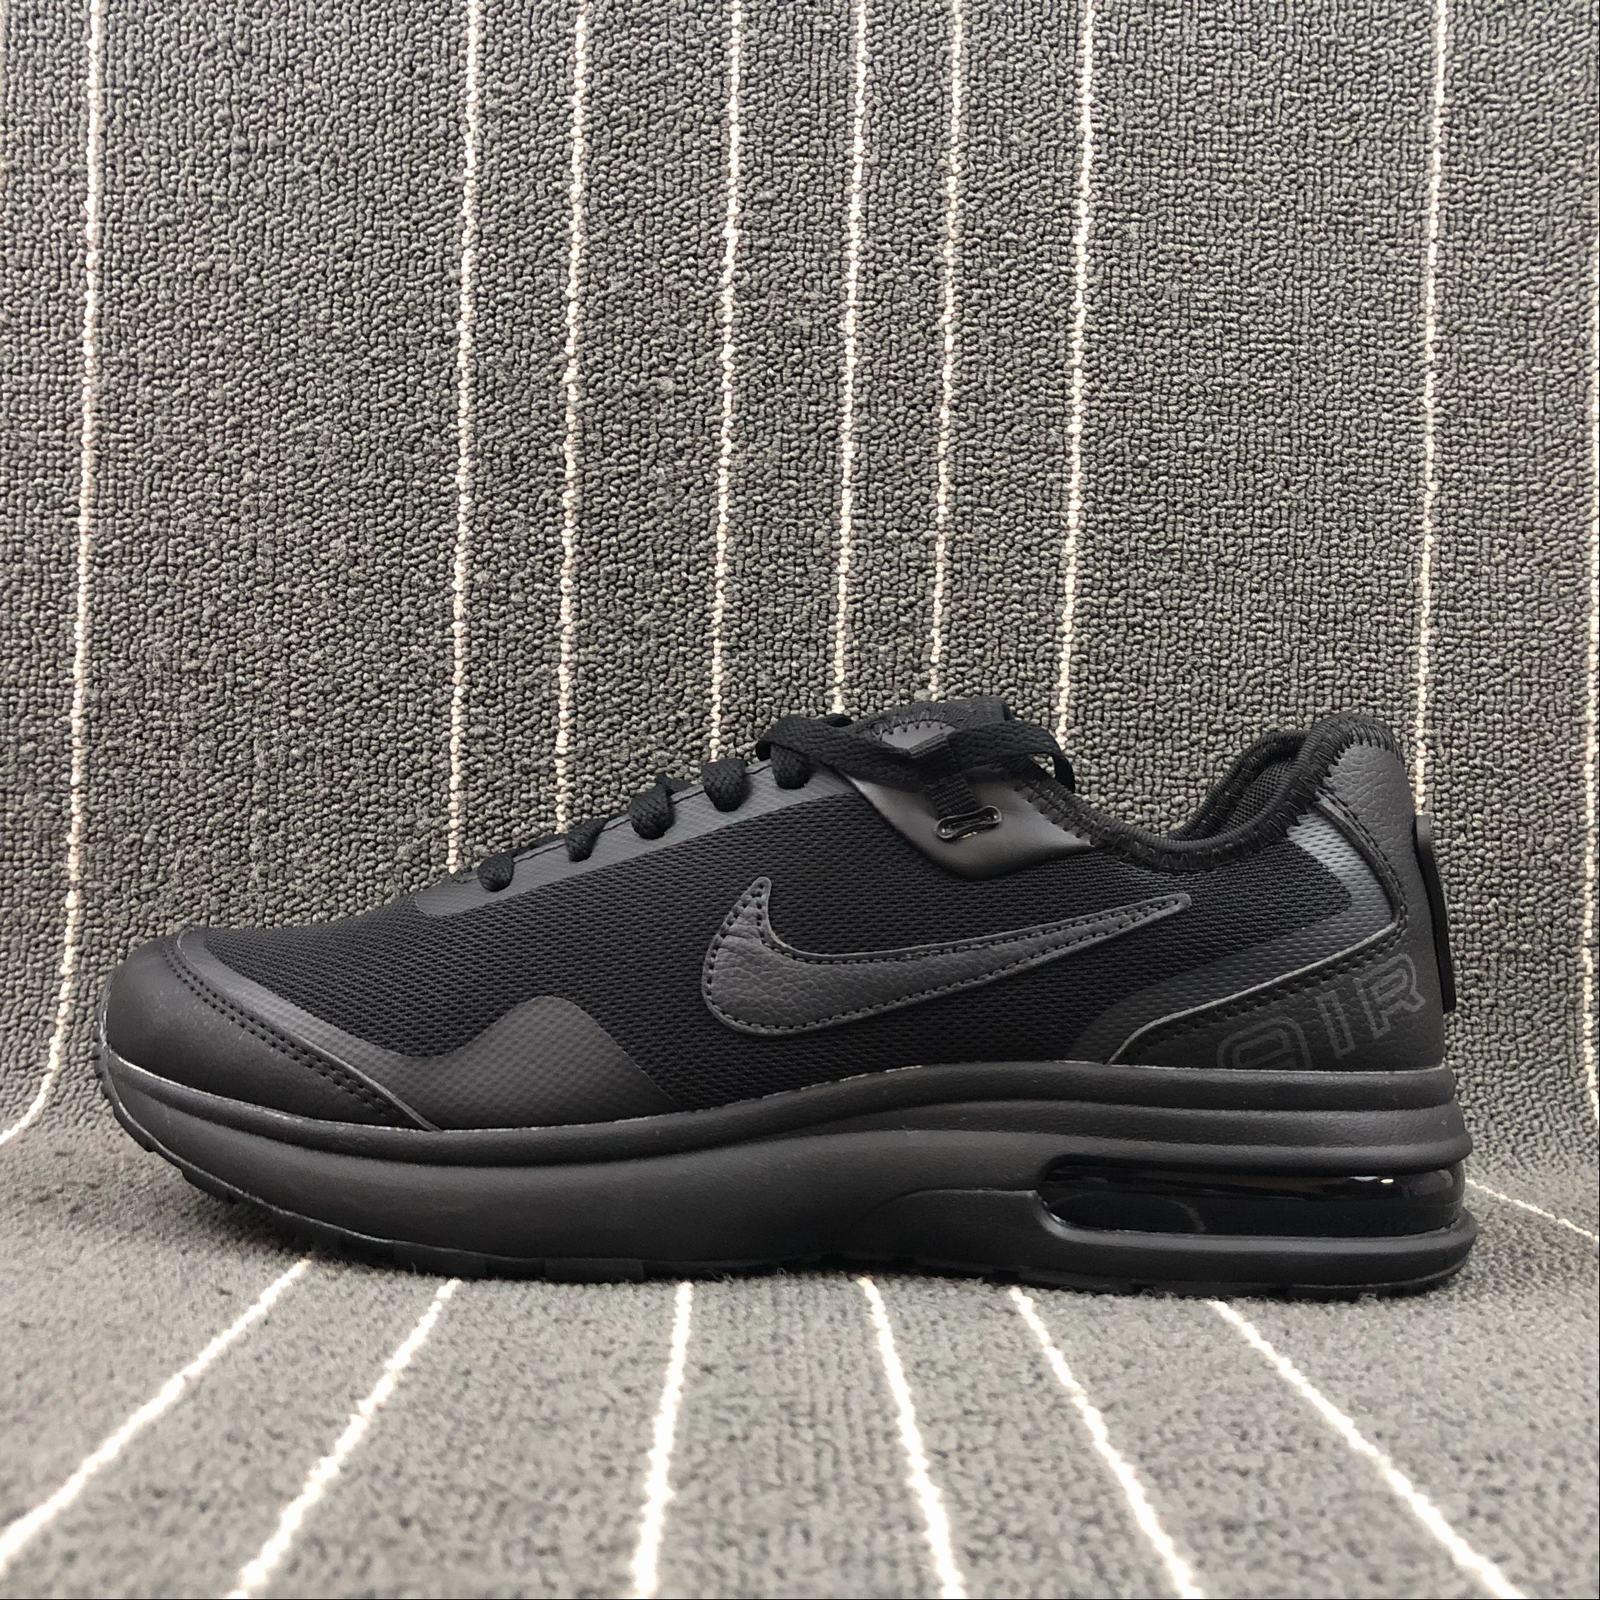 de1dd019 Мужские кроссовки Nike Air Max LB Men